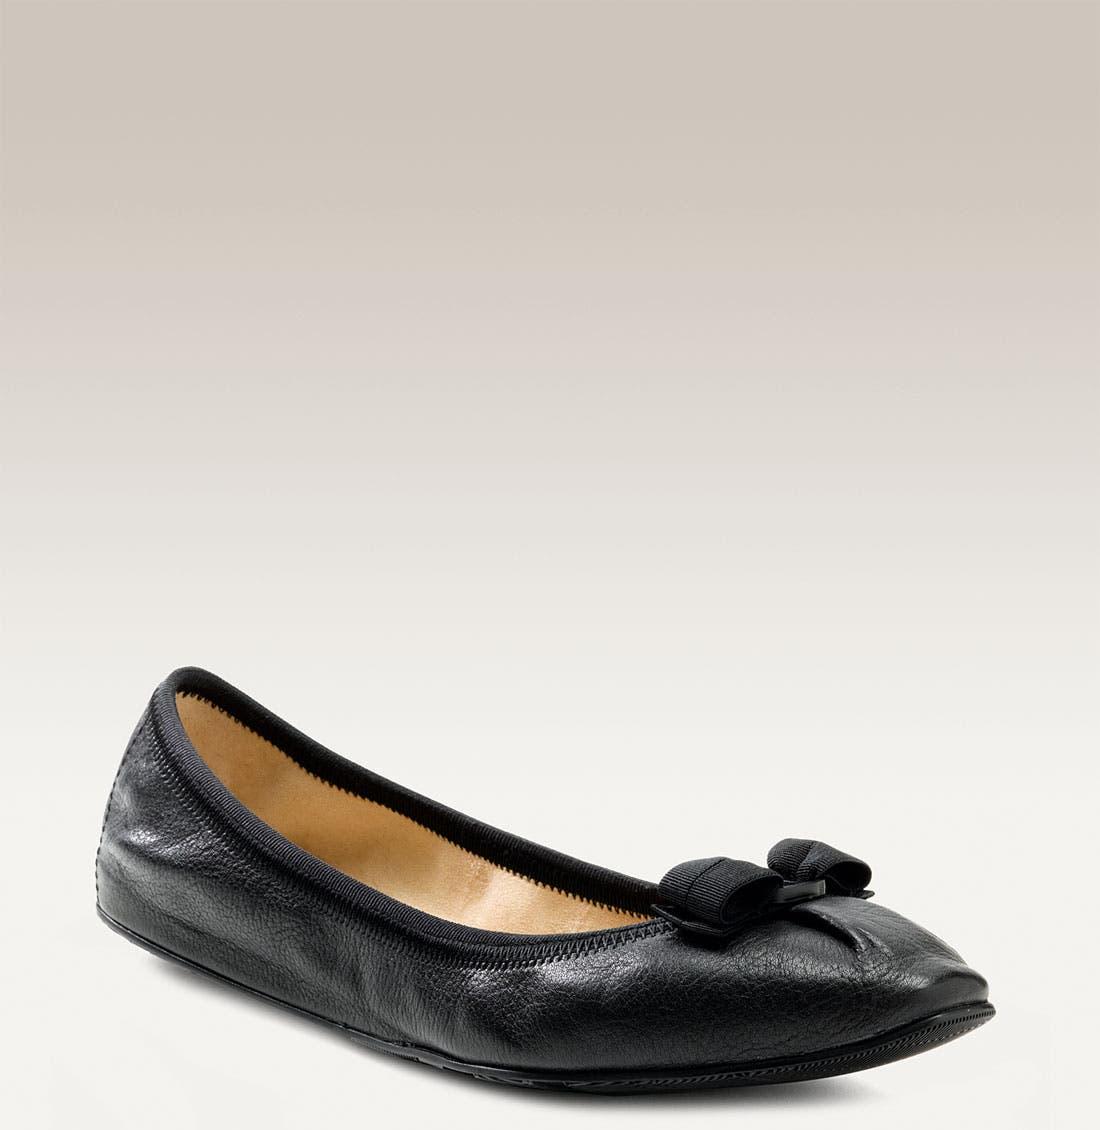 Alternate Image 1 Selected - Salvatore Ferragamo Skimmer Flat (Women)